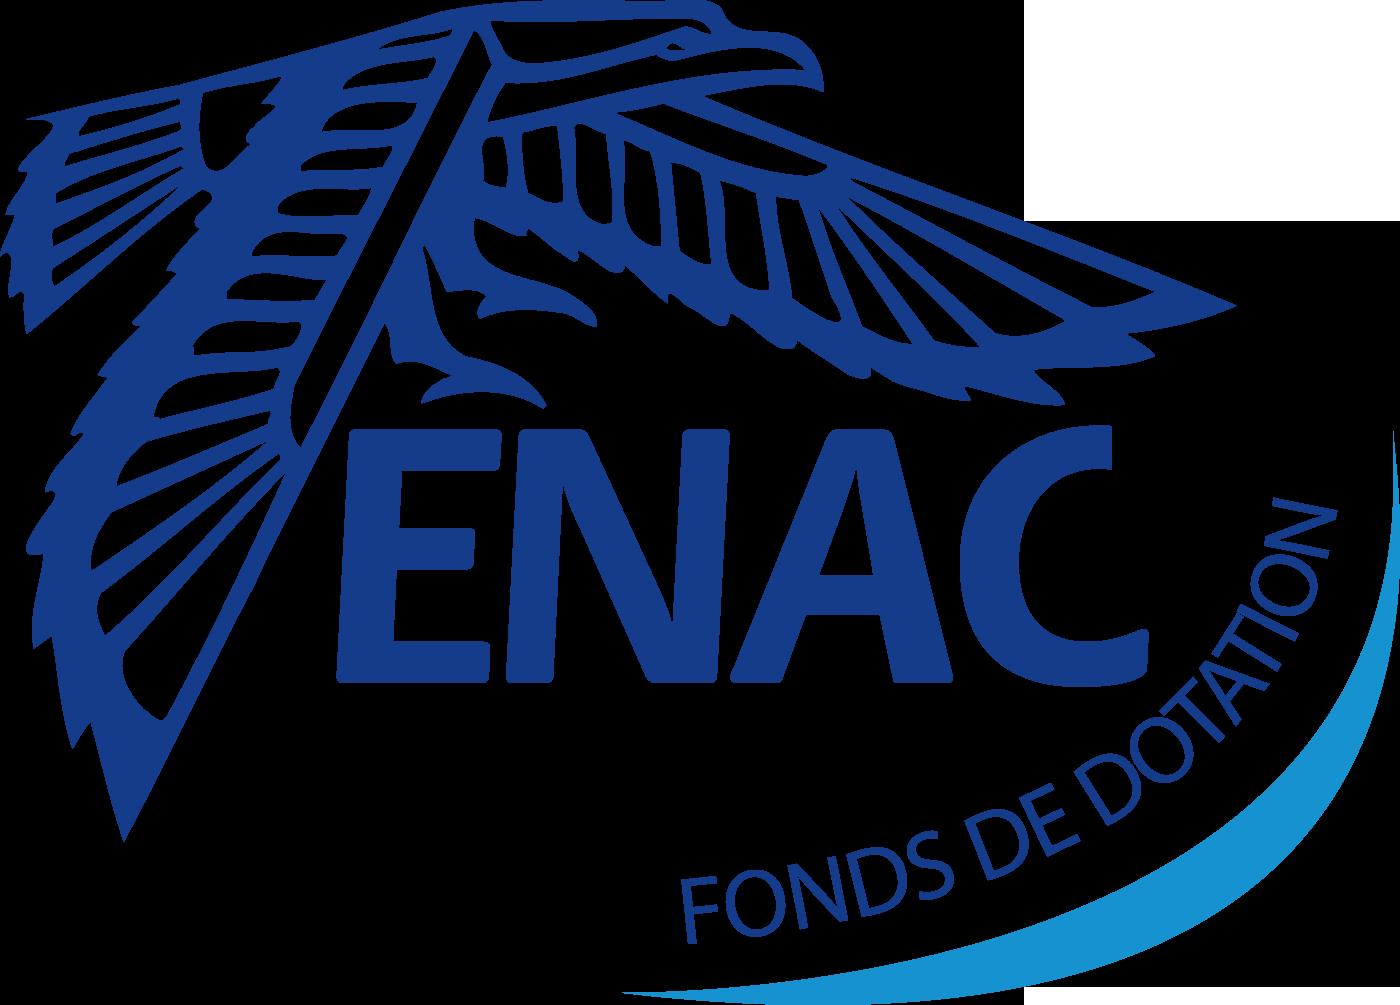 Logo Fonds de dotation ENAC